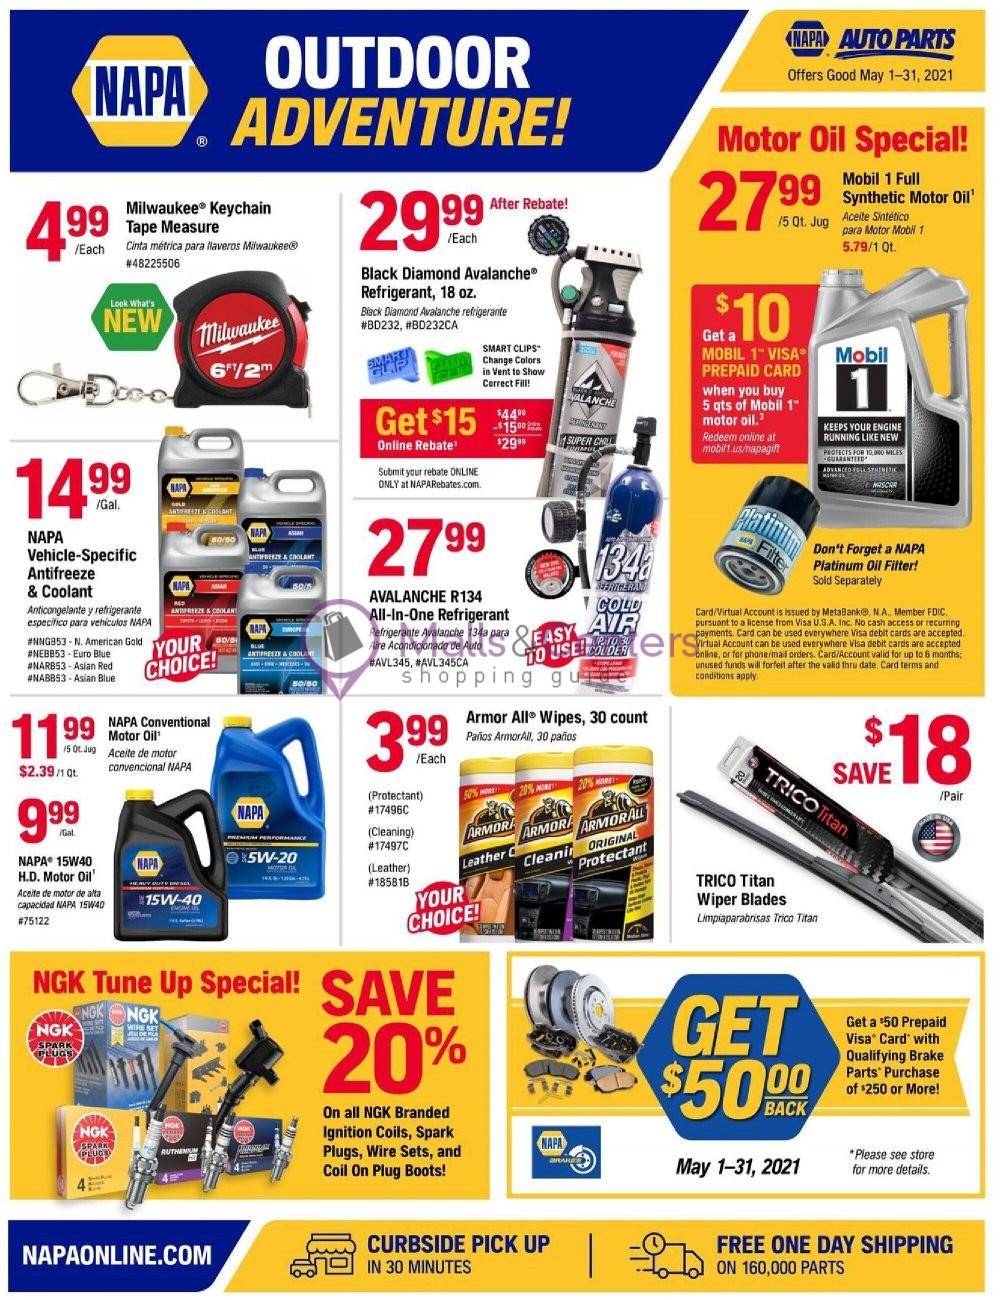 weekly ads Napa Auto Parts - page 1 - mallscenters.com